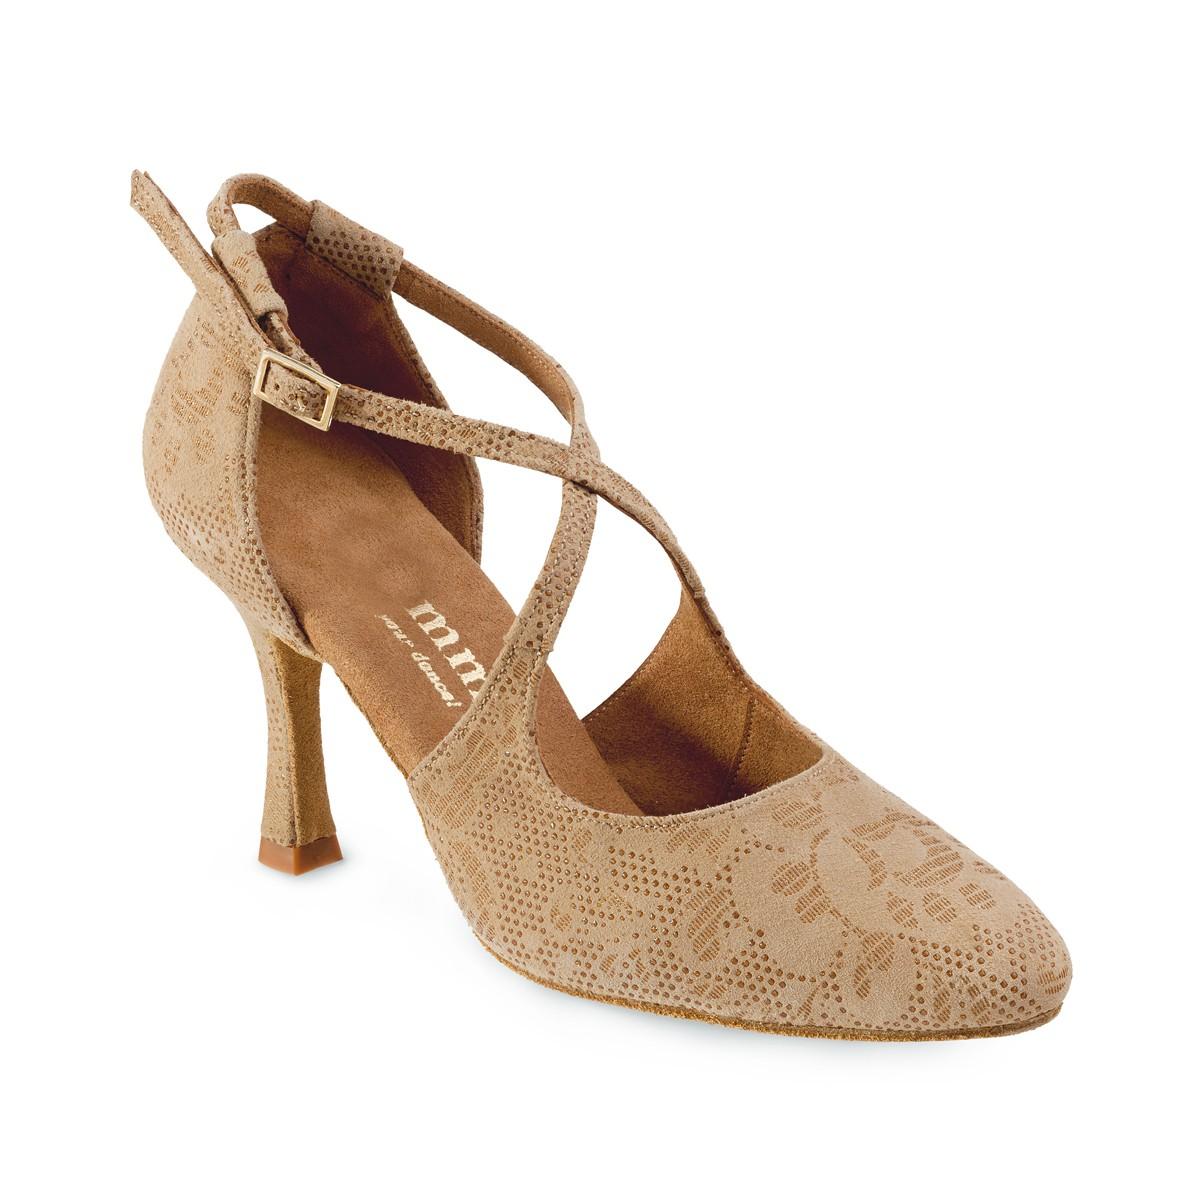 7319e928395 Nude lace wedding heels LADIES COMFORTABLE HIGH HEELS IN BEIGE LACE